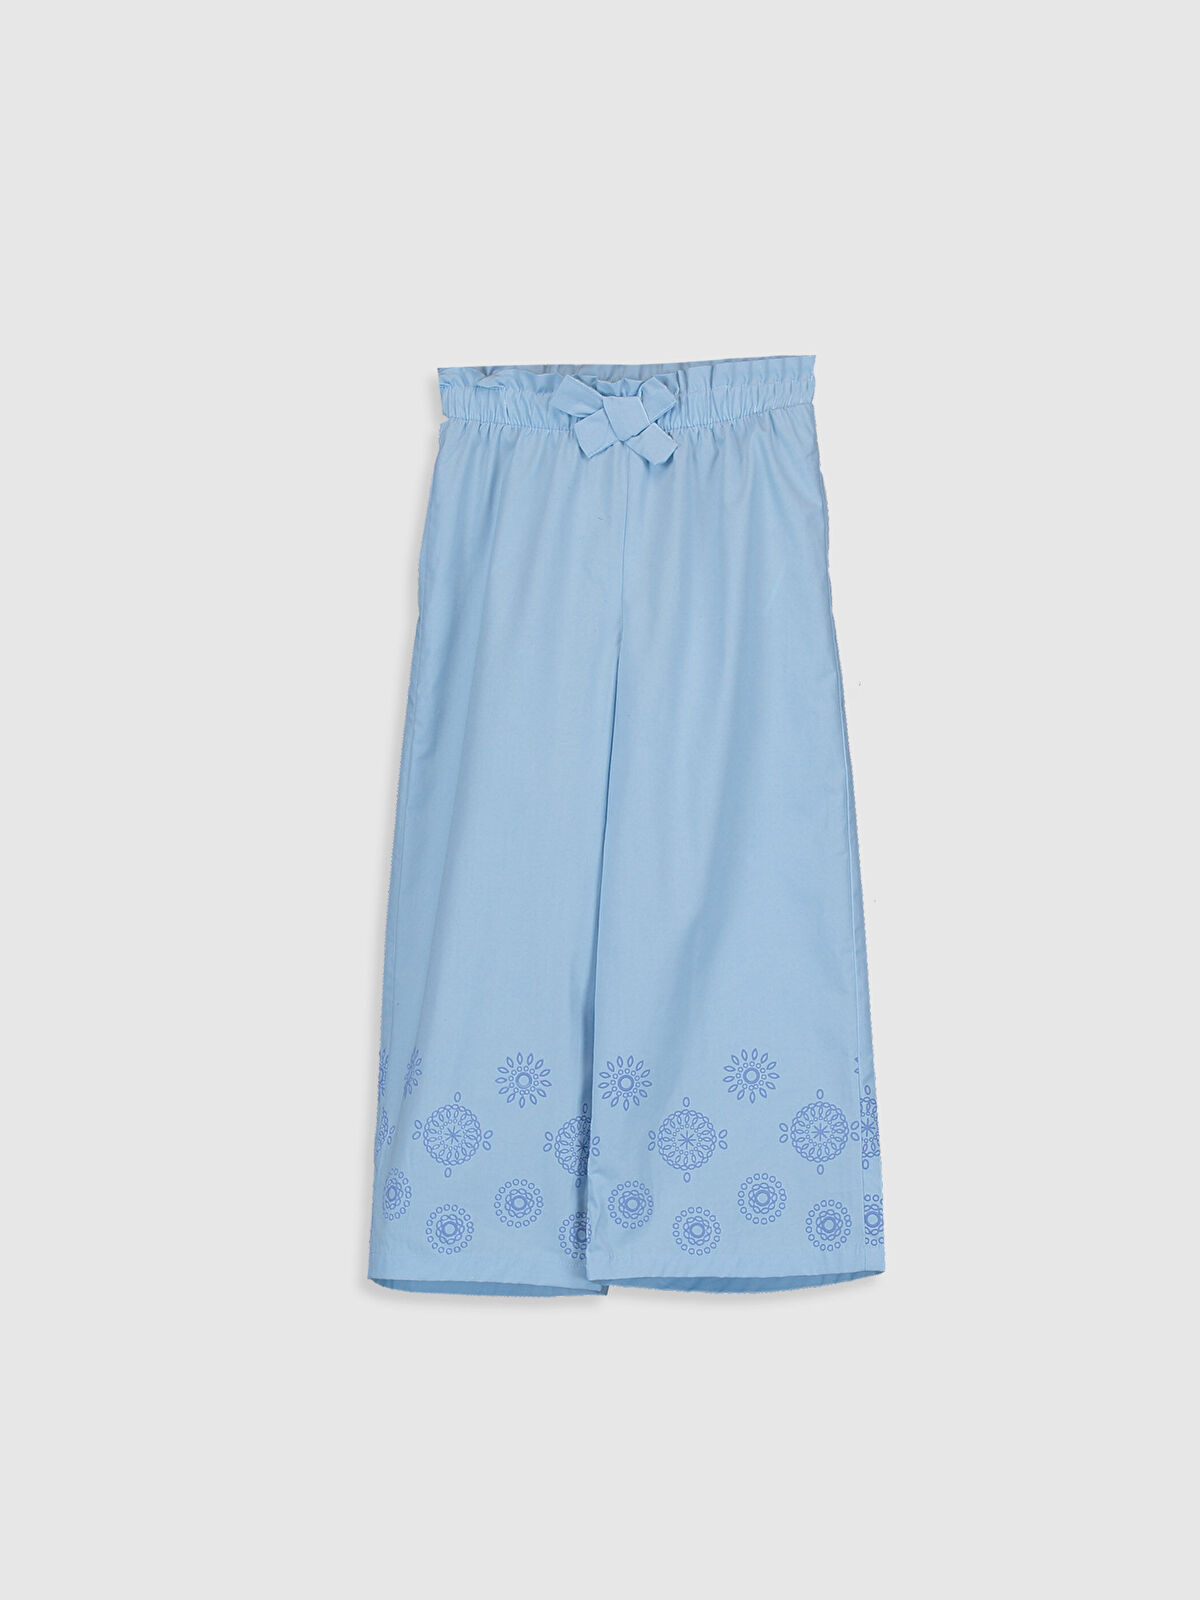 Kız Çocuk Nakışlı Pamuklu Pantolon - LC WAIKIKI